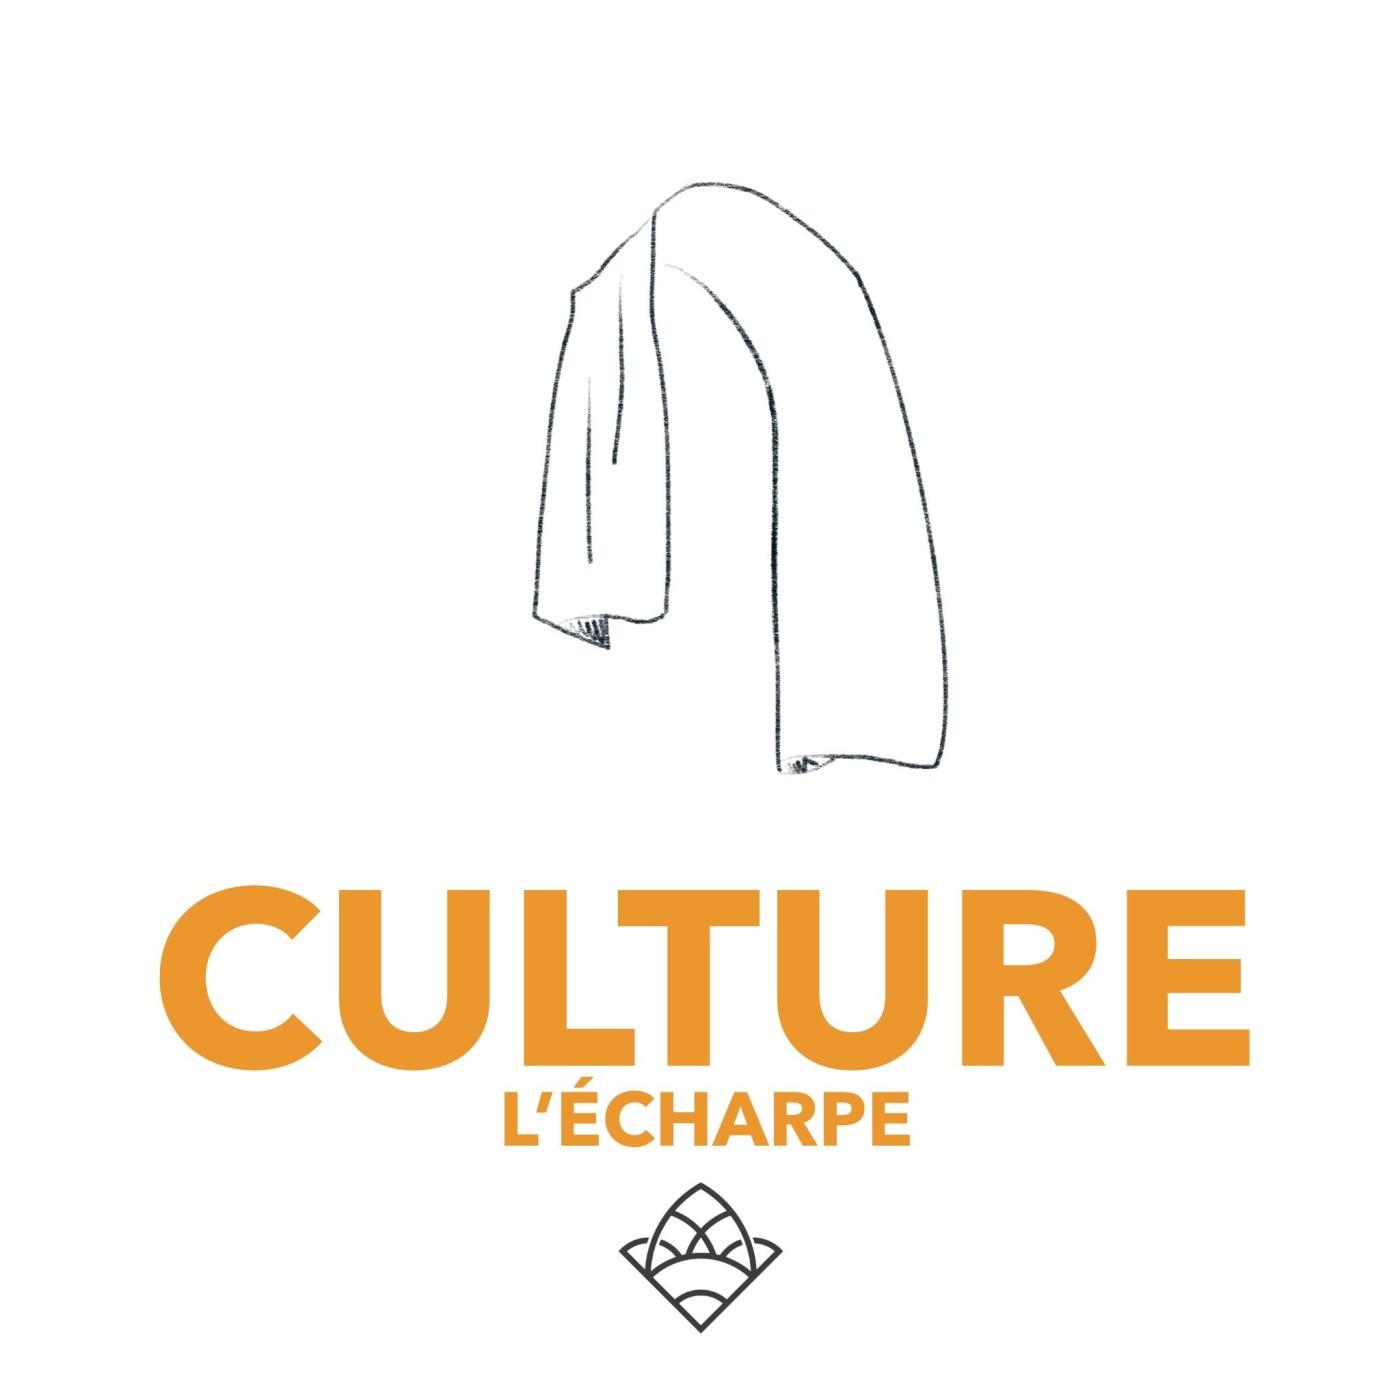 (culture 21) L'écharpe